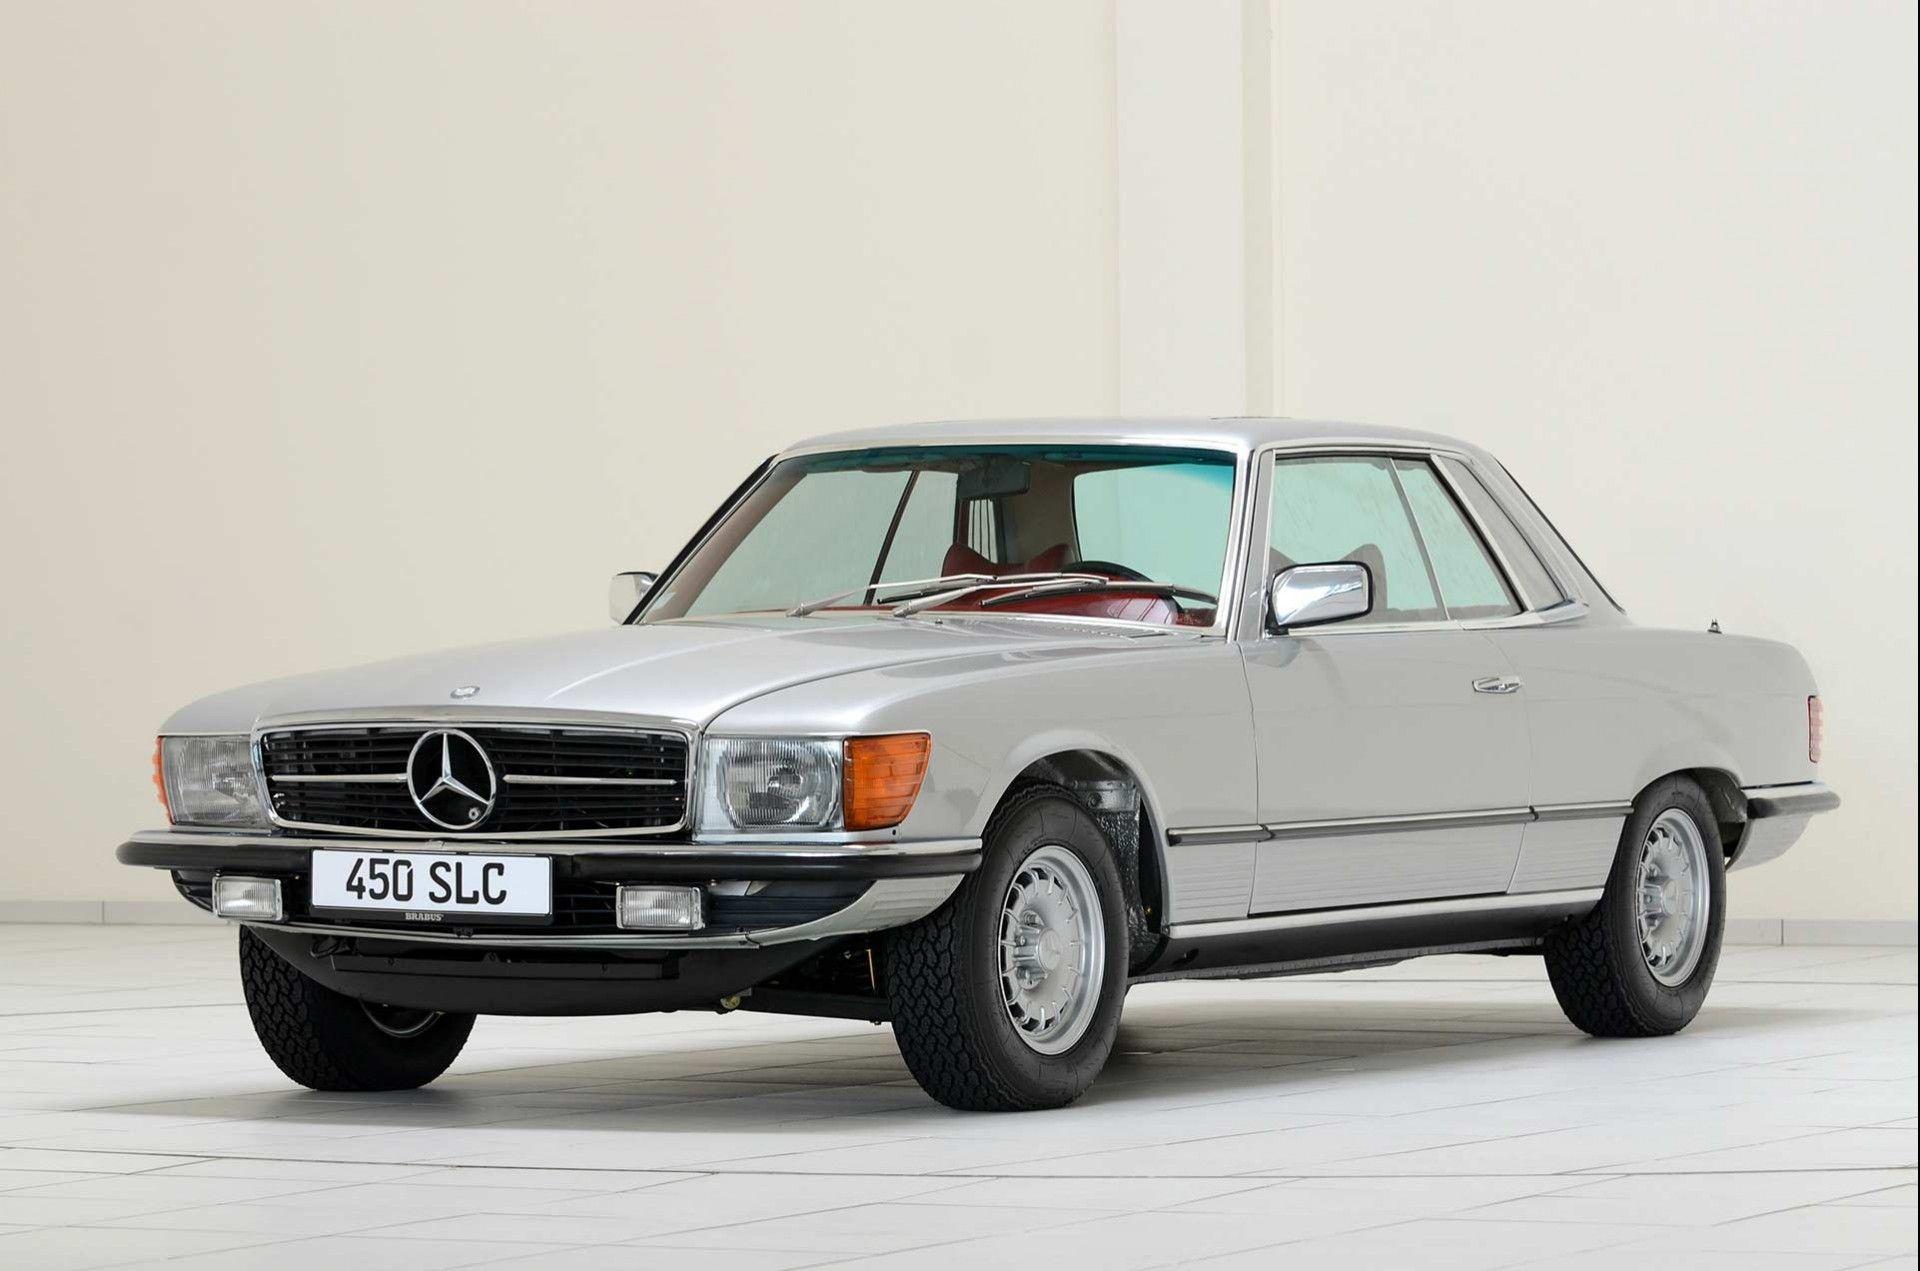 1979 mercedes benz 450 slc r 107 silver car c 107 pinterest slc mercedes benz and cars. Black Bedroom Furniture Sets. Home Design Ideas